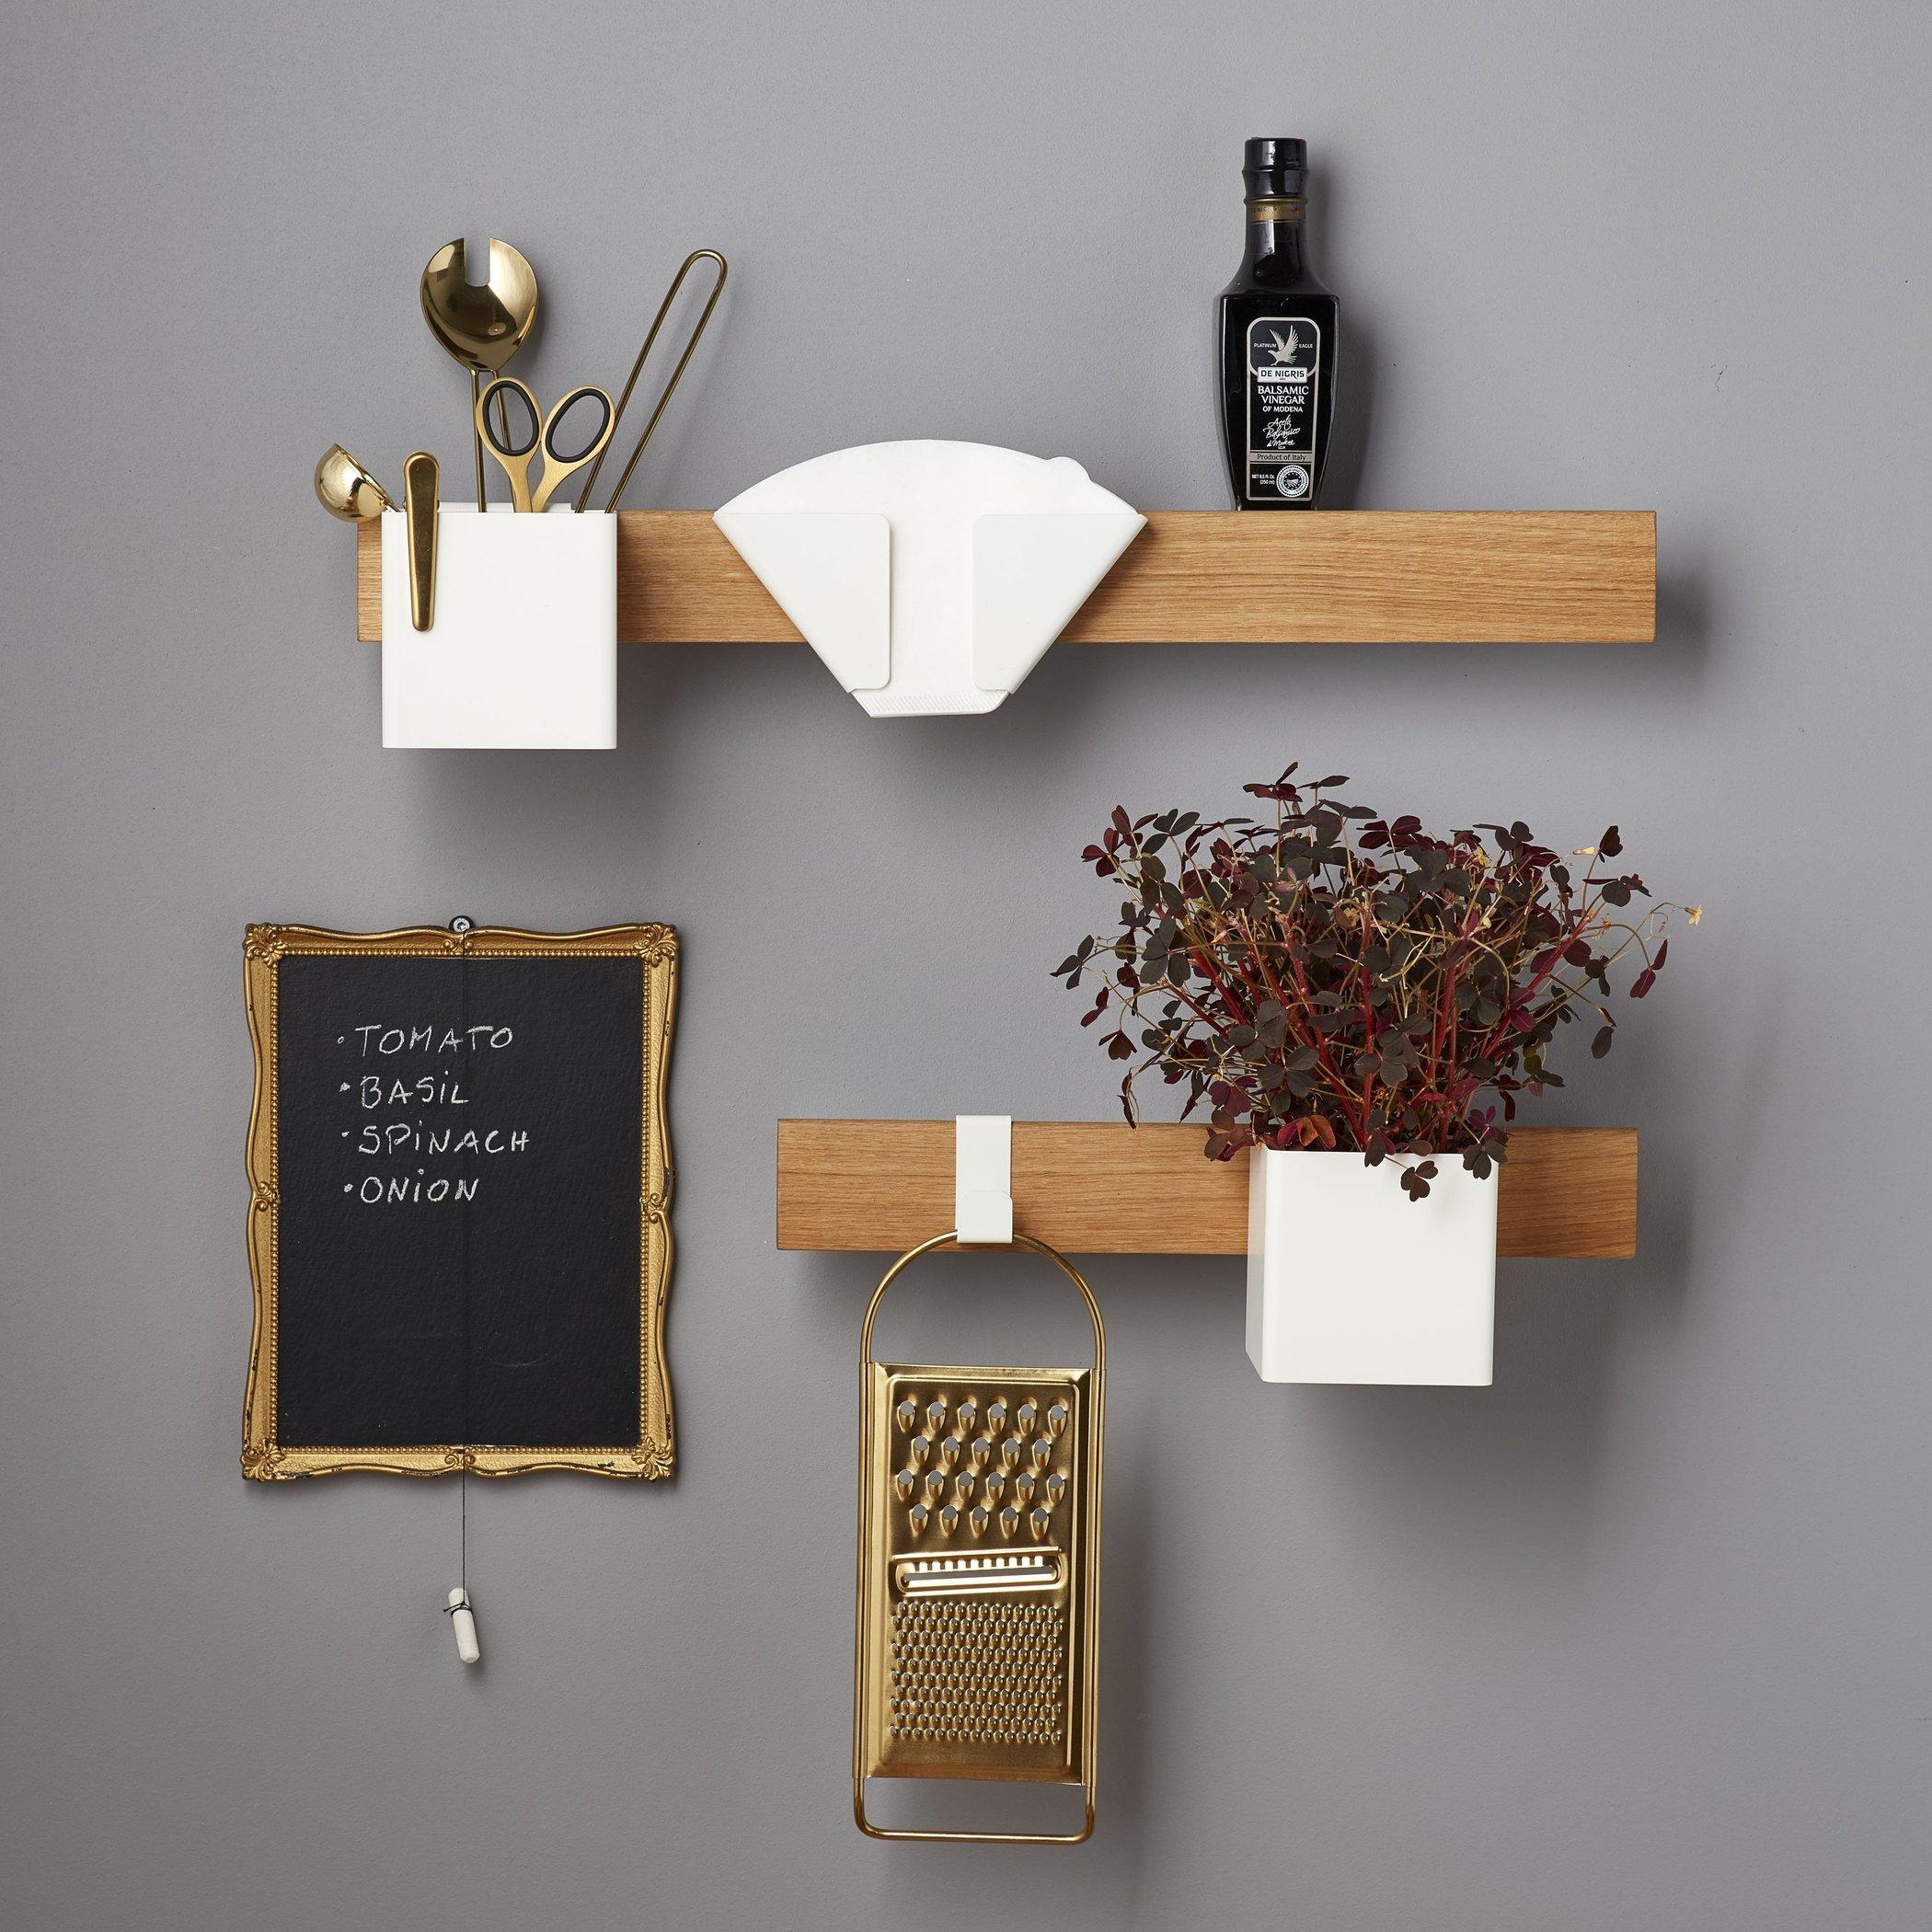 scandinavianfeeling coffee filter holder shelf